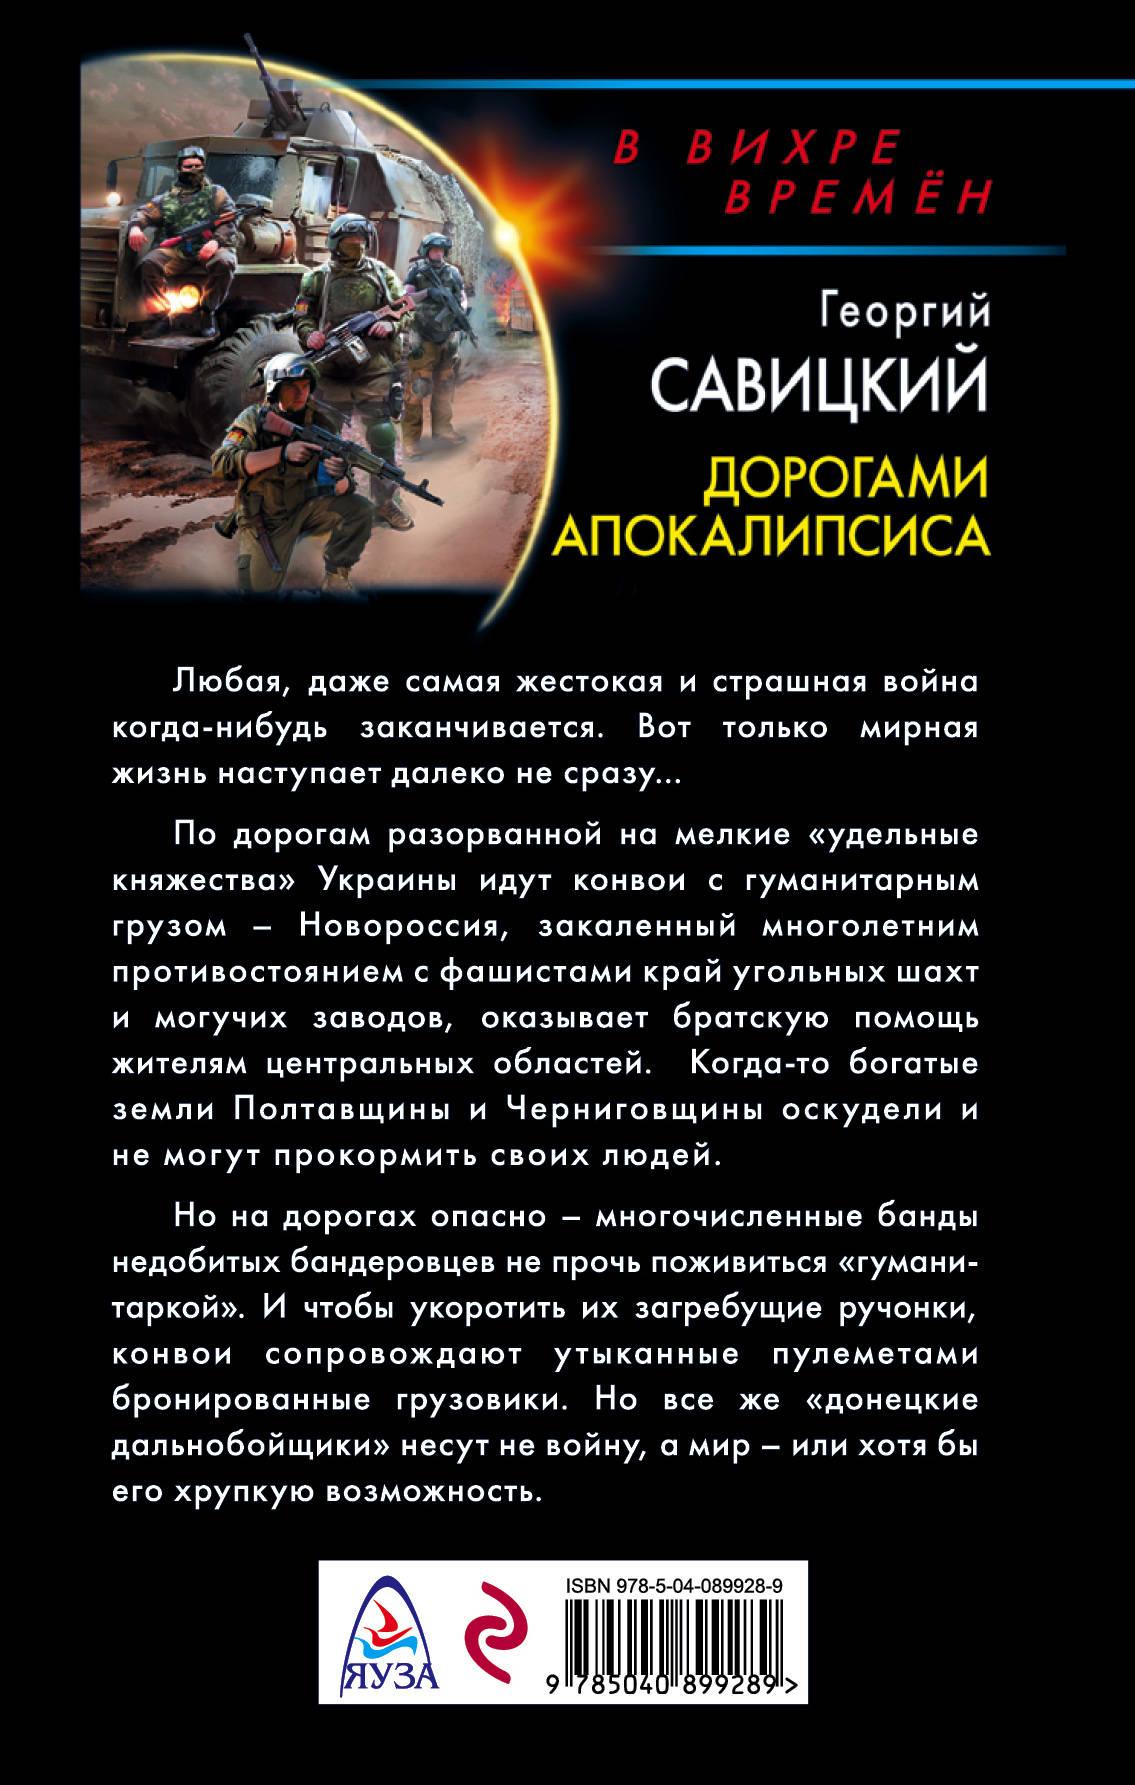 Дорогами апокалипсиса. Георгий Савицкий